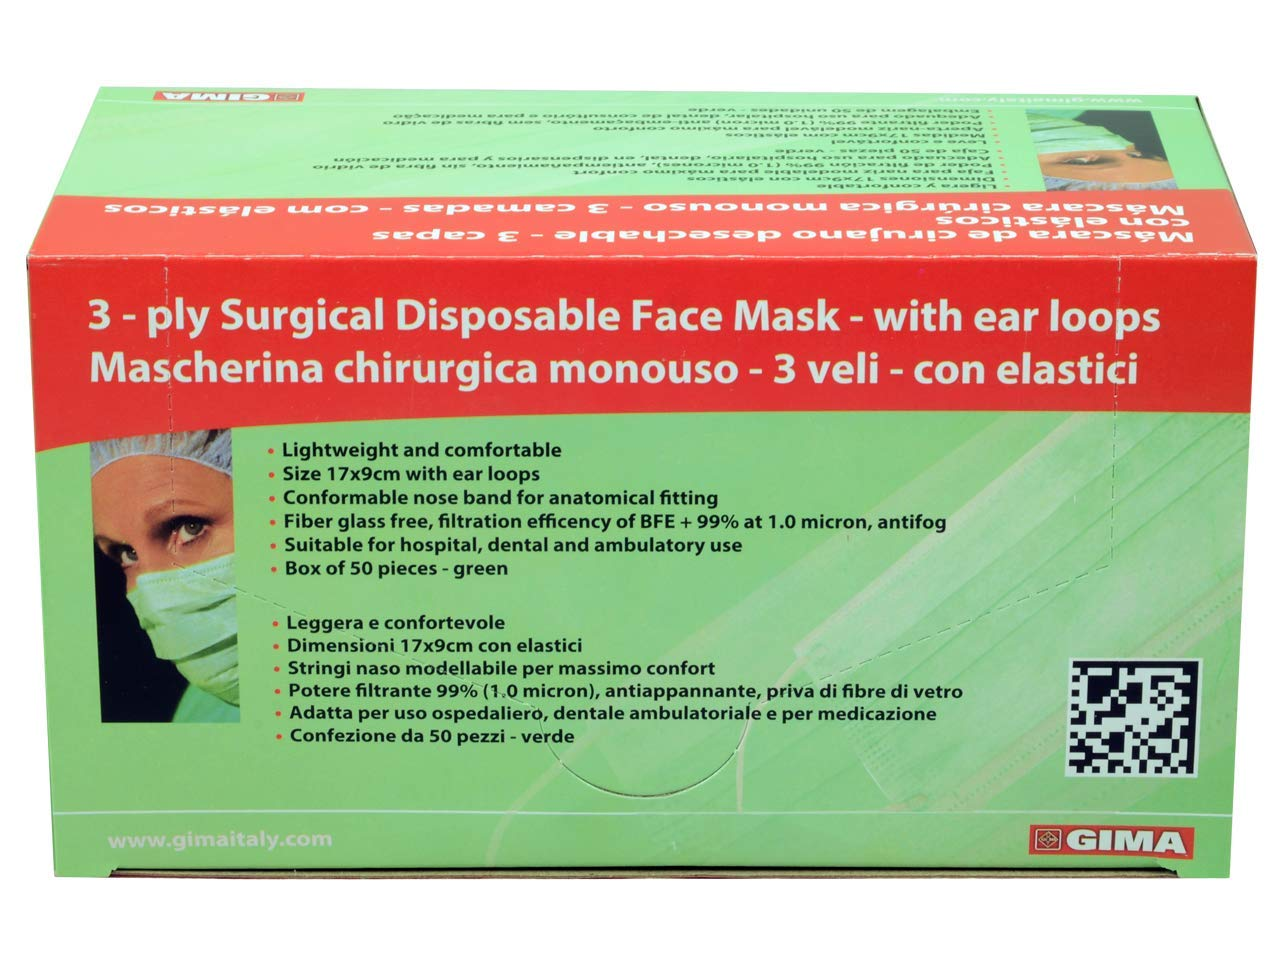 maschera facciale 3 veli